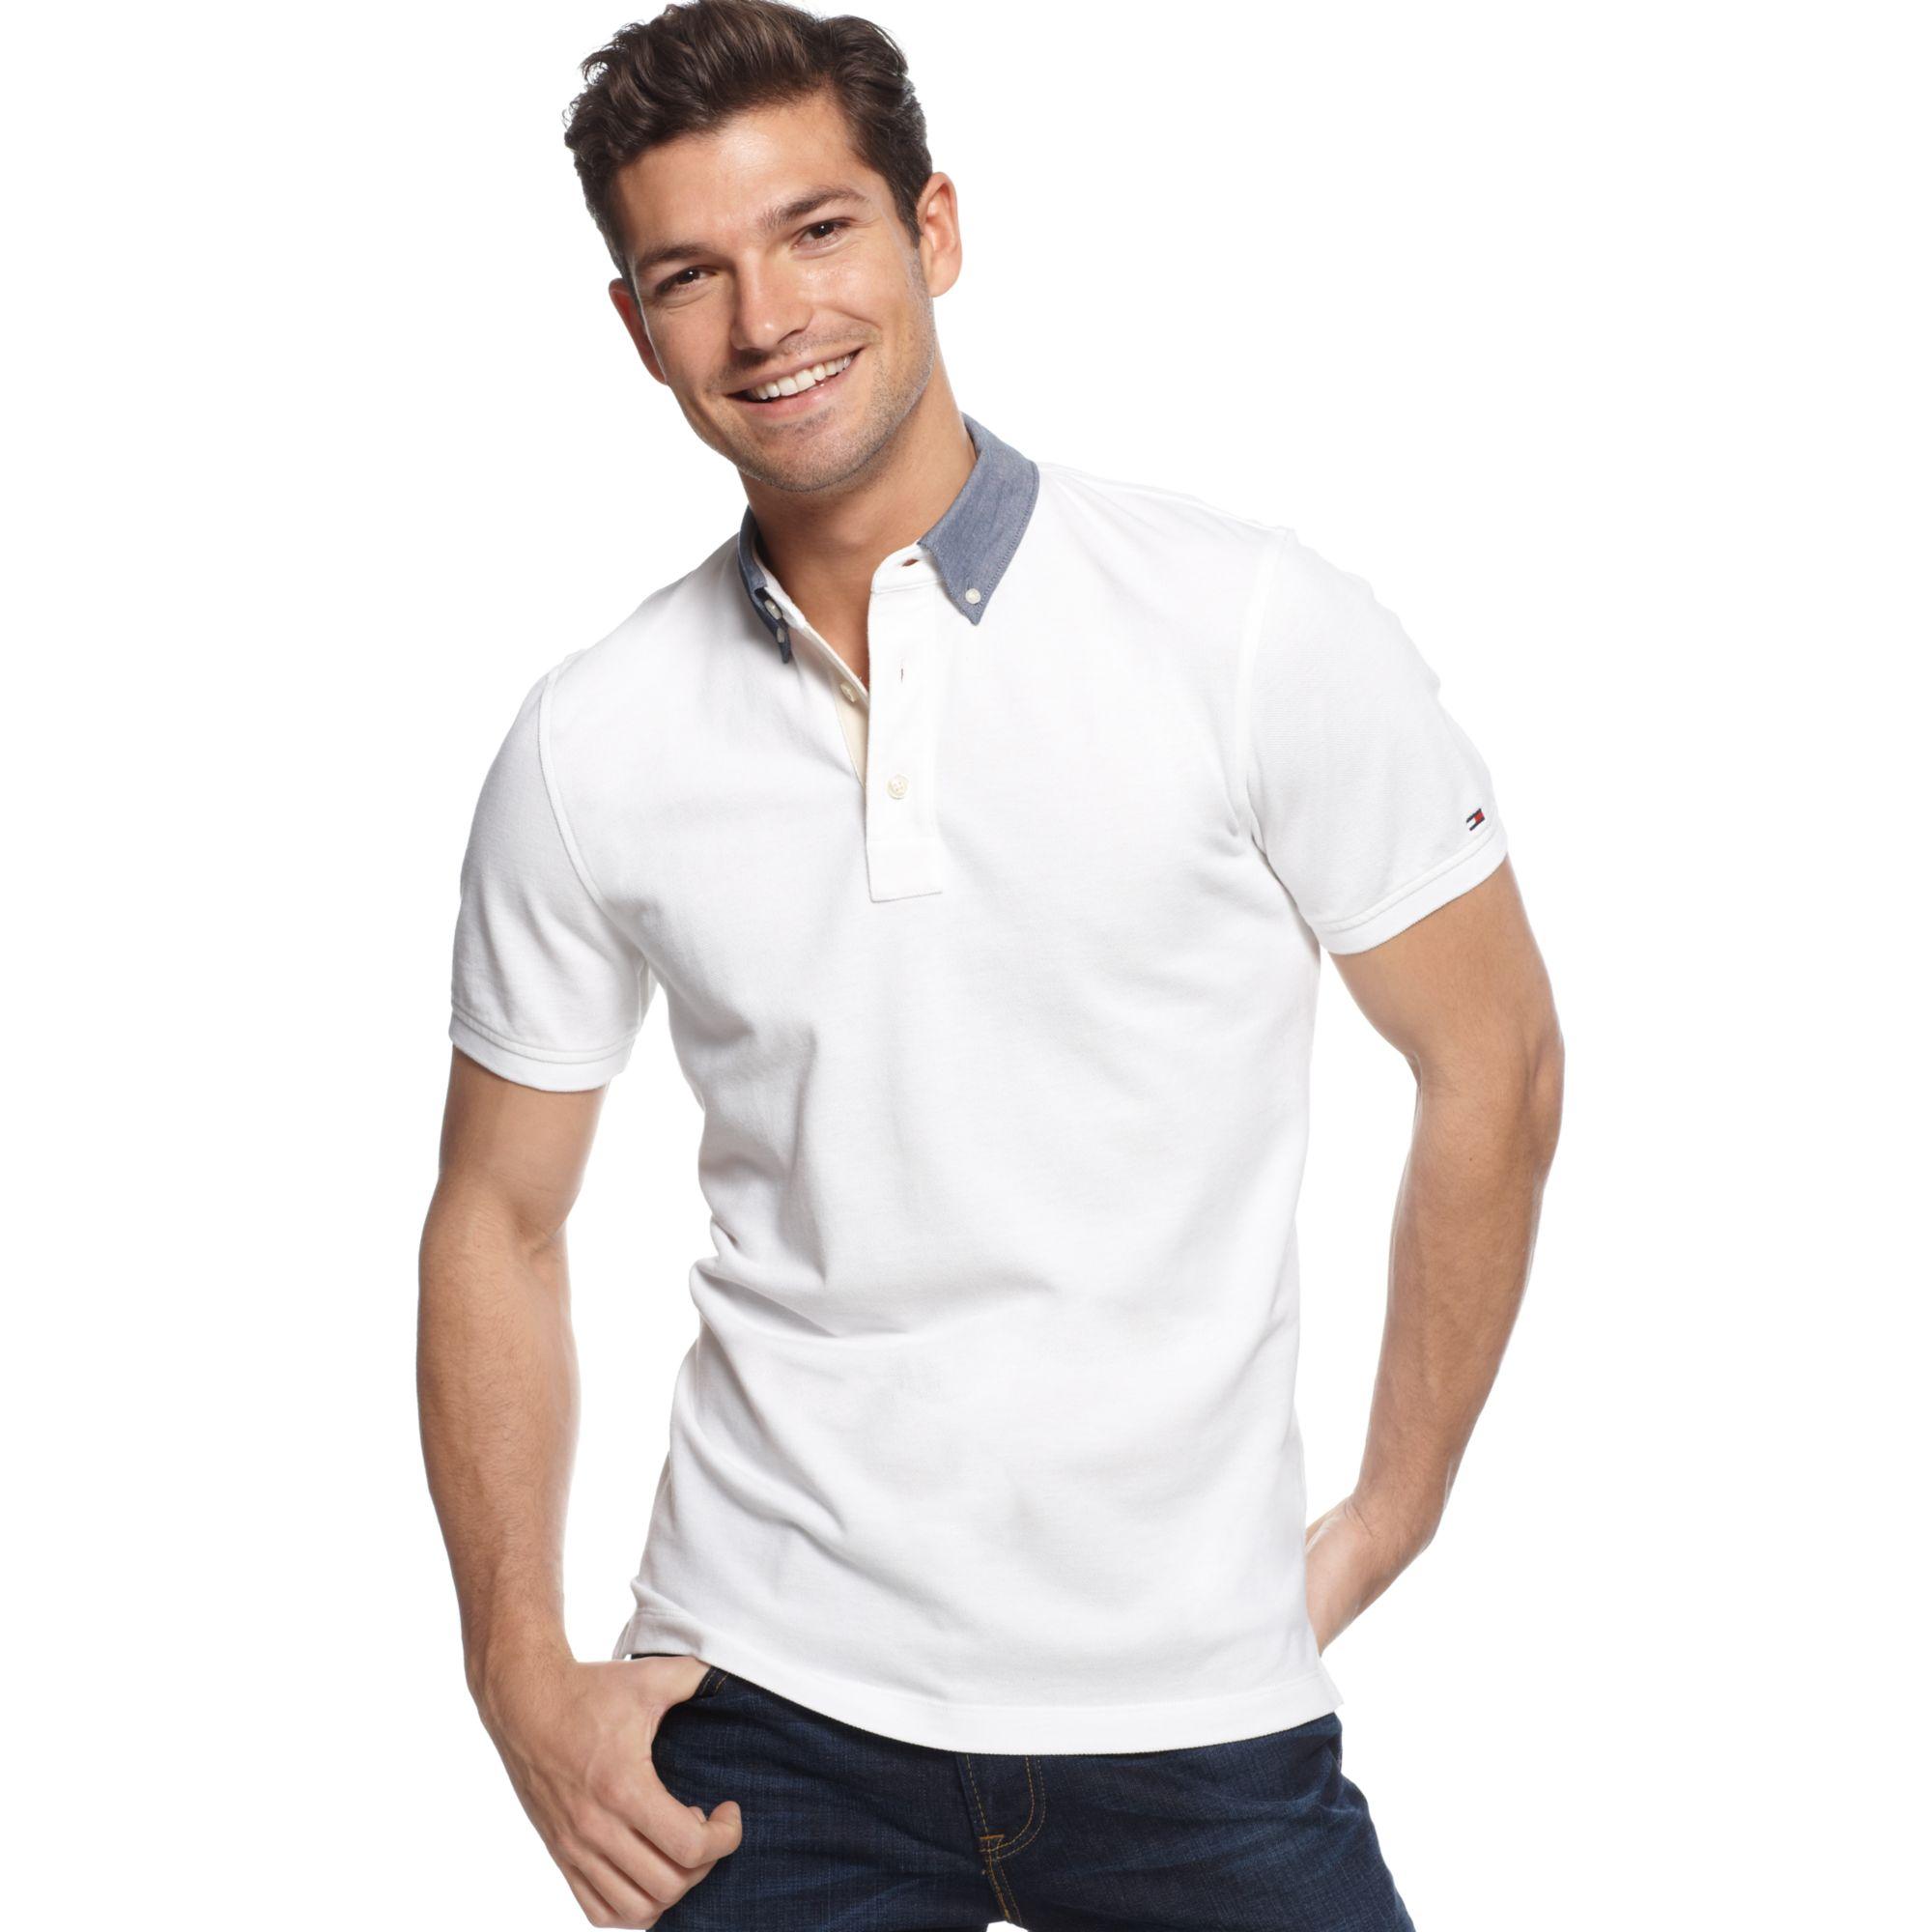 b22da31b9a27bc Lyst - Tommy Hilfiger Dexter Polo Shirt in White for Men